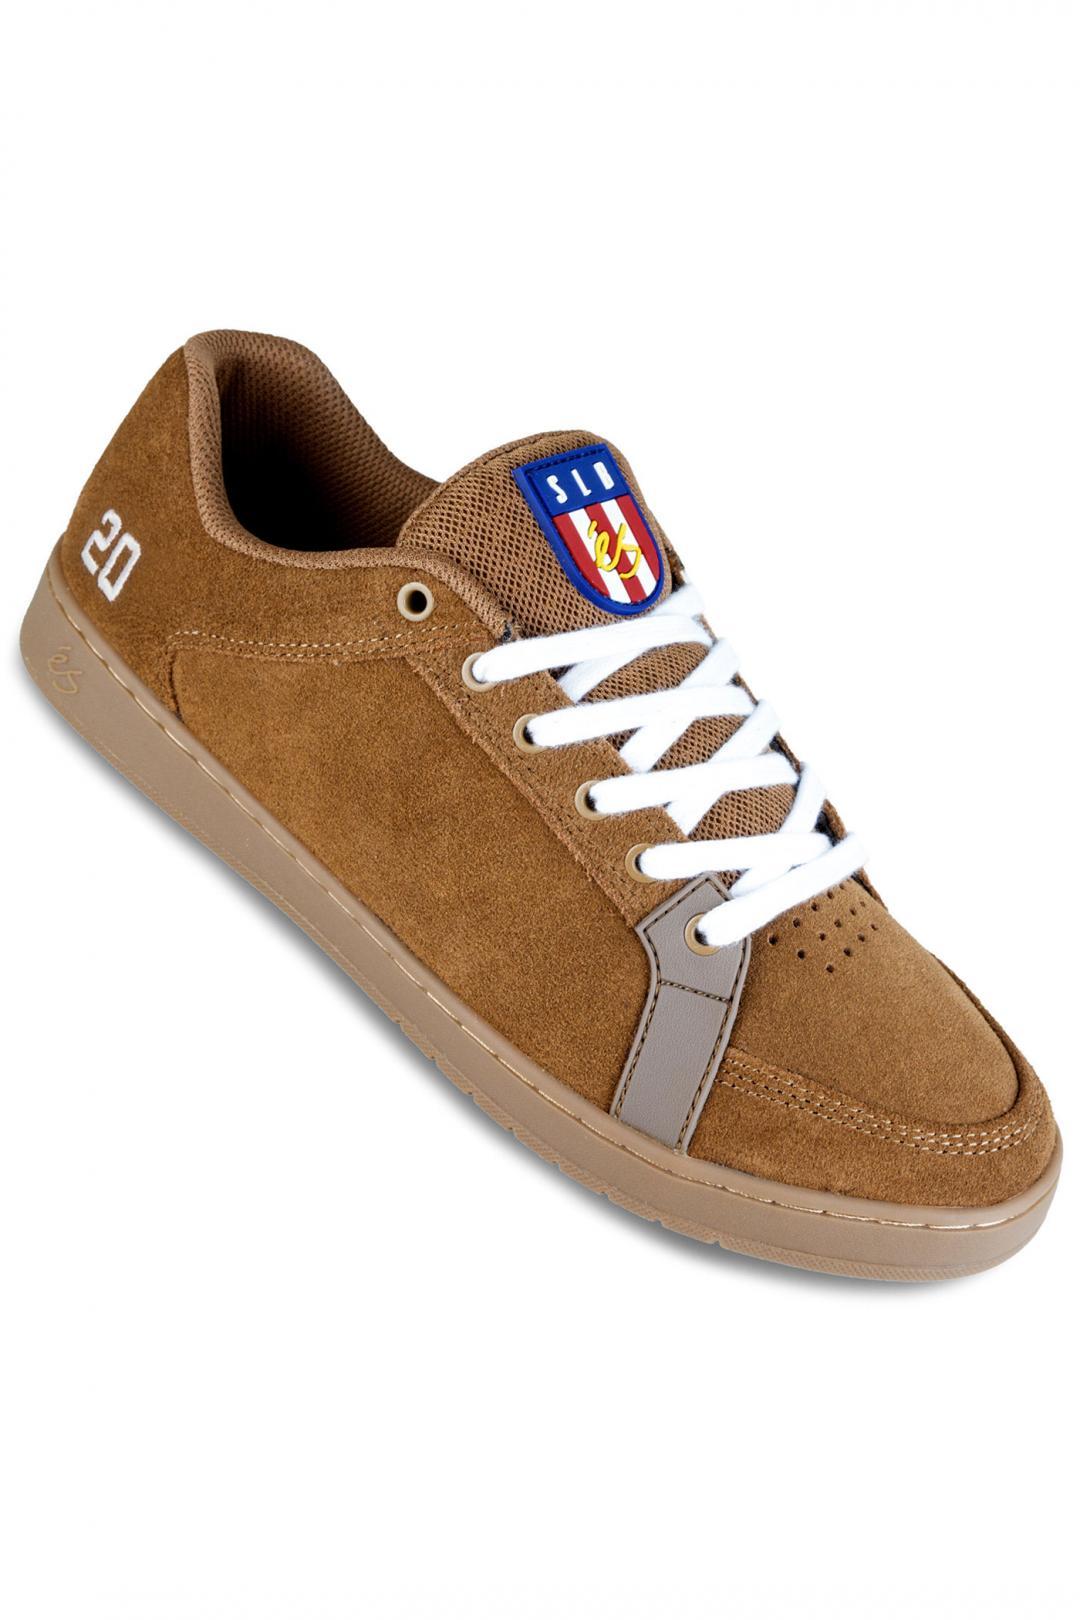 Uomo éS SAL 20 brown gum | Scarpe da skate